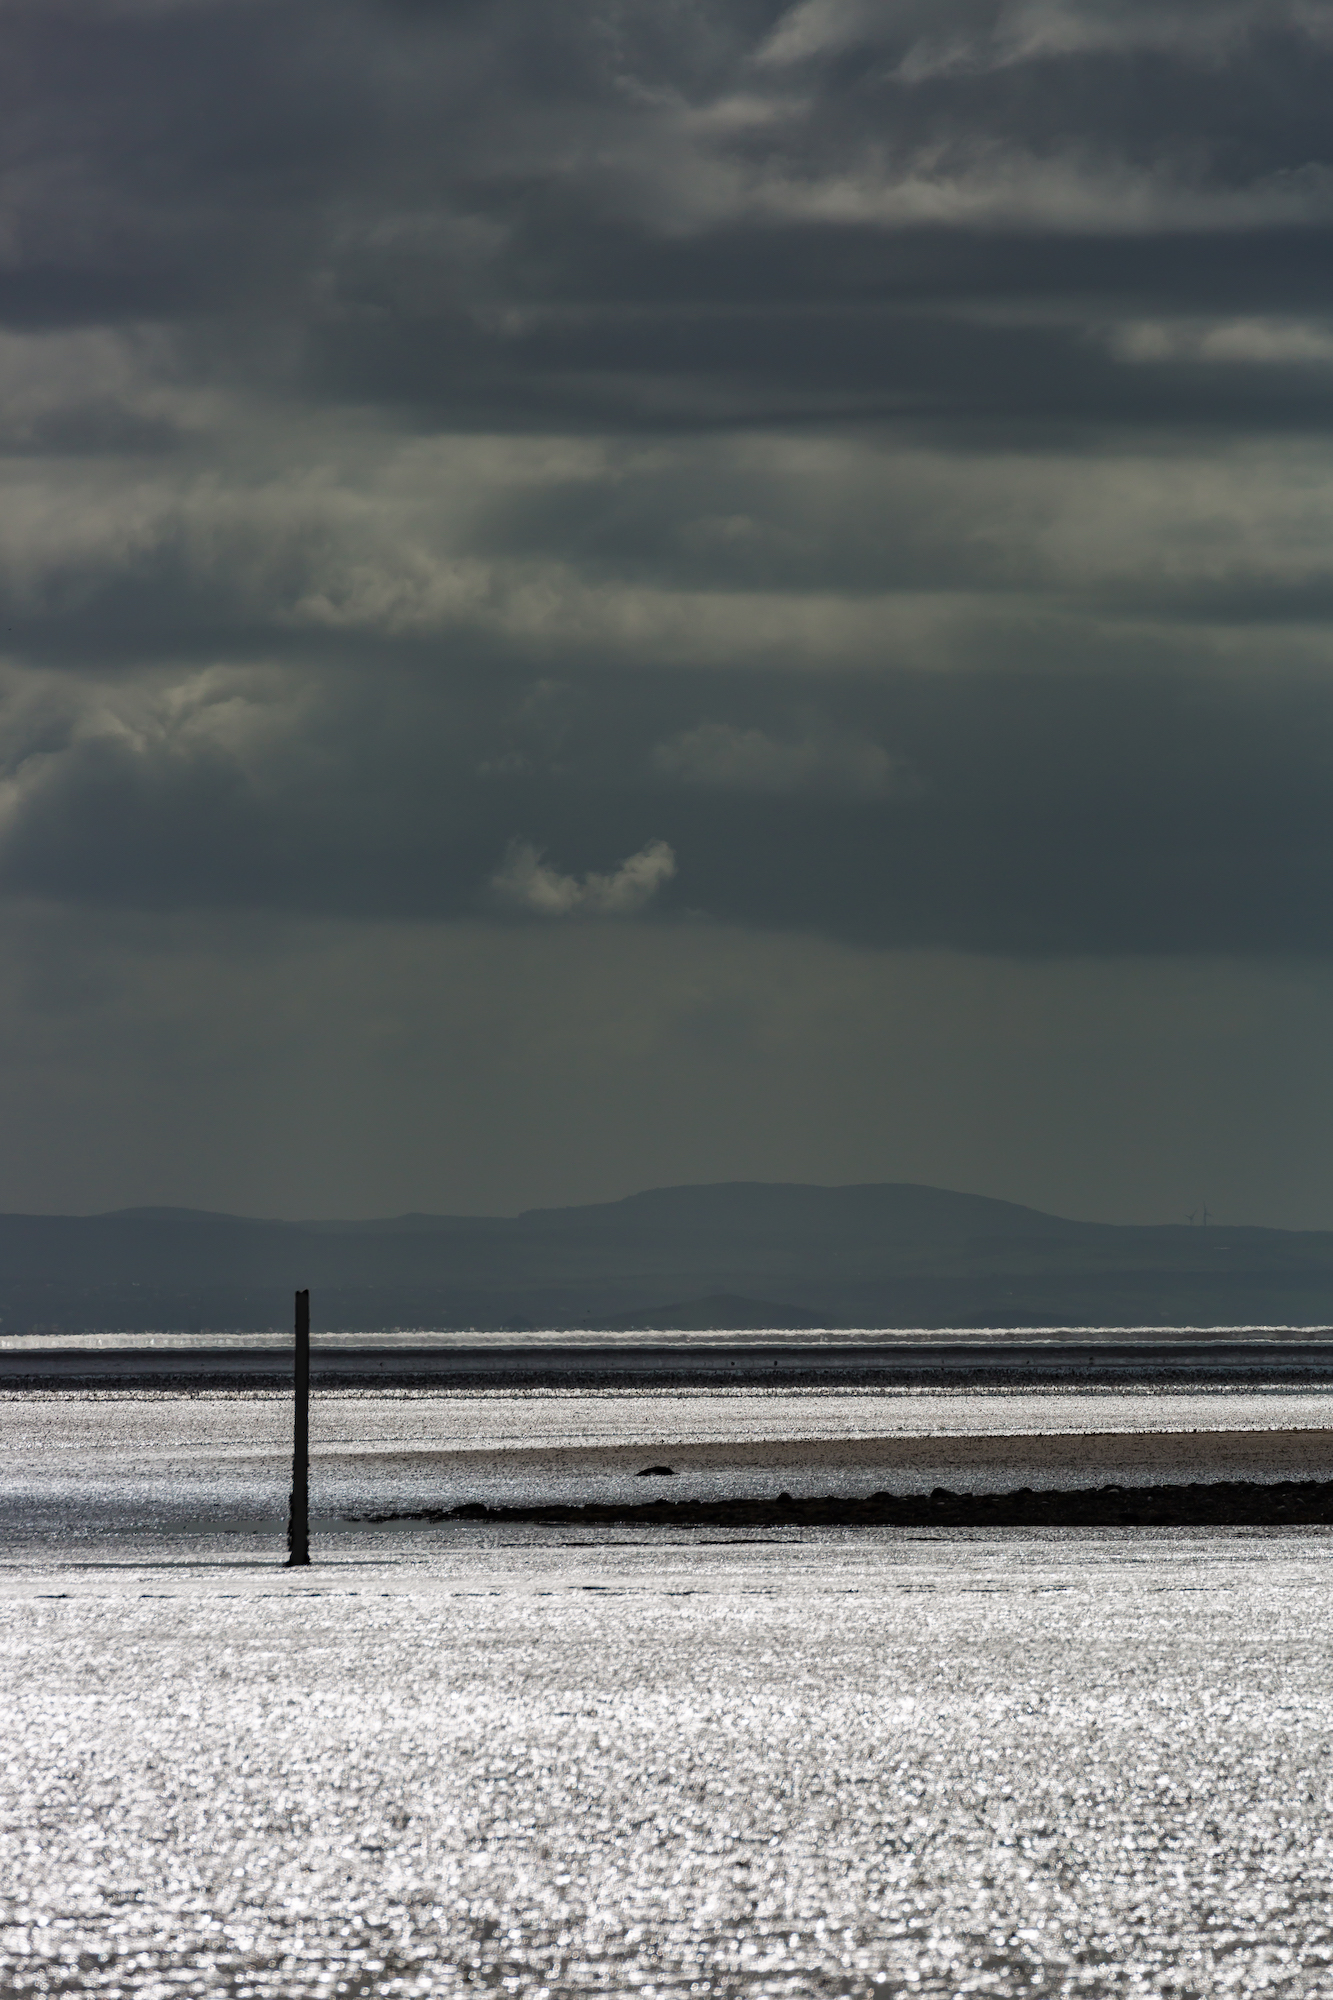 (477) Sandyhills Beach, Solway Firth, East Stewartry, Dumfries and Galloway, Scotland.jpg